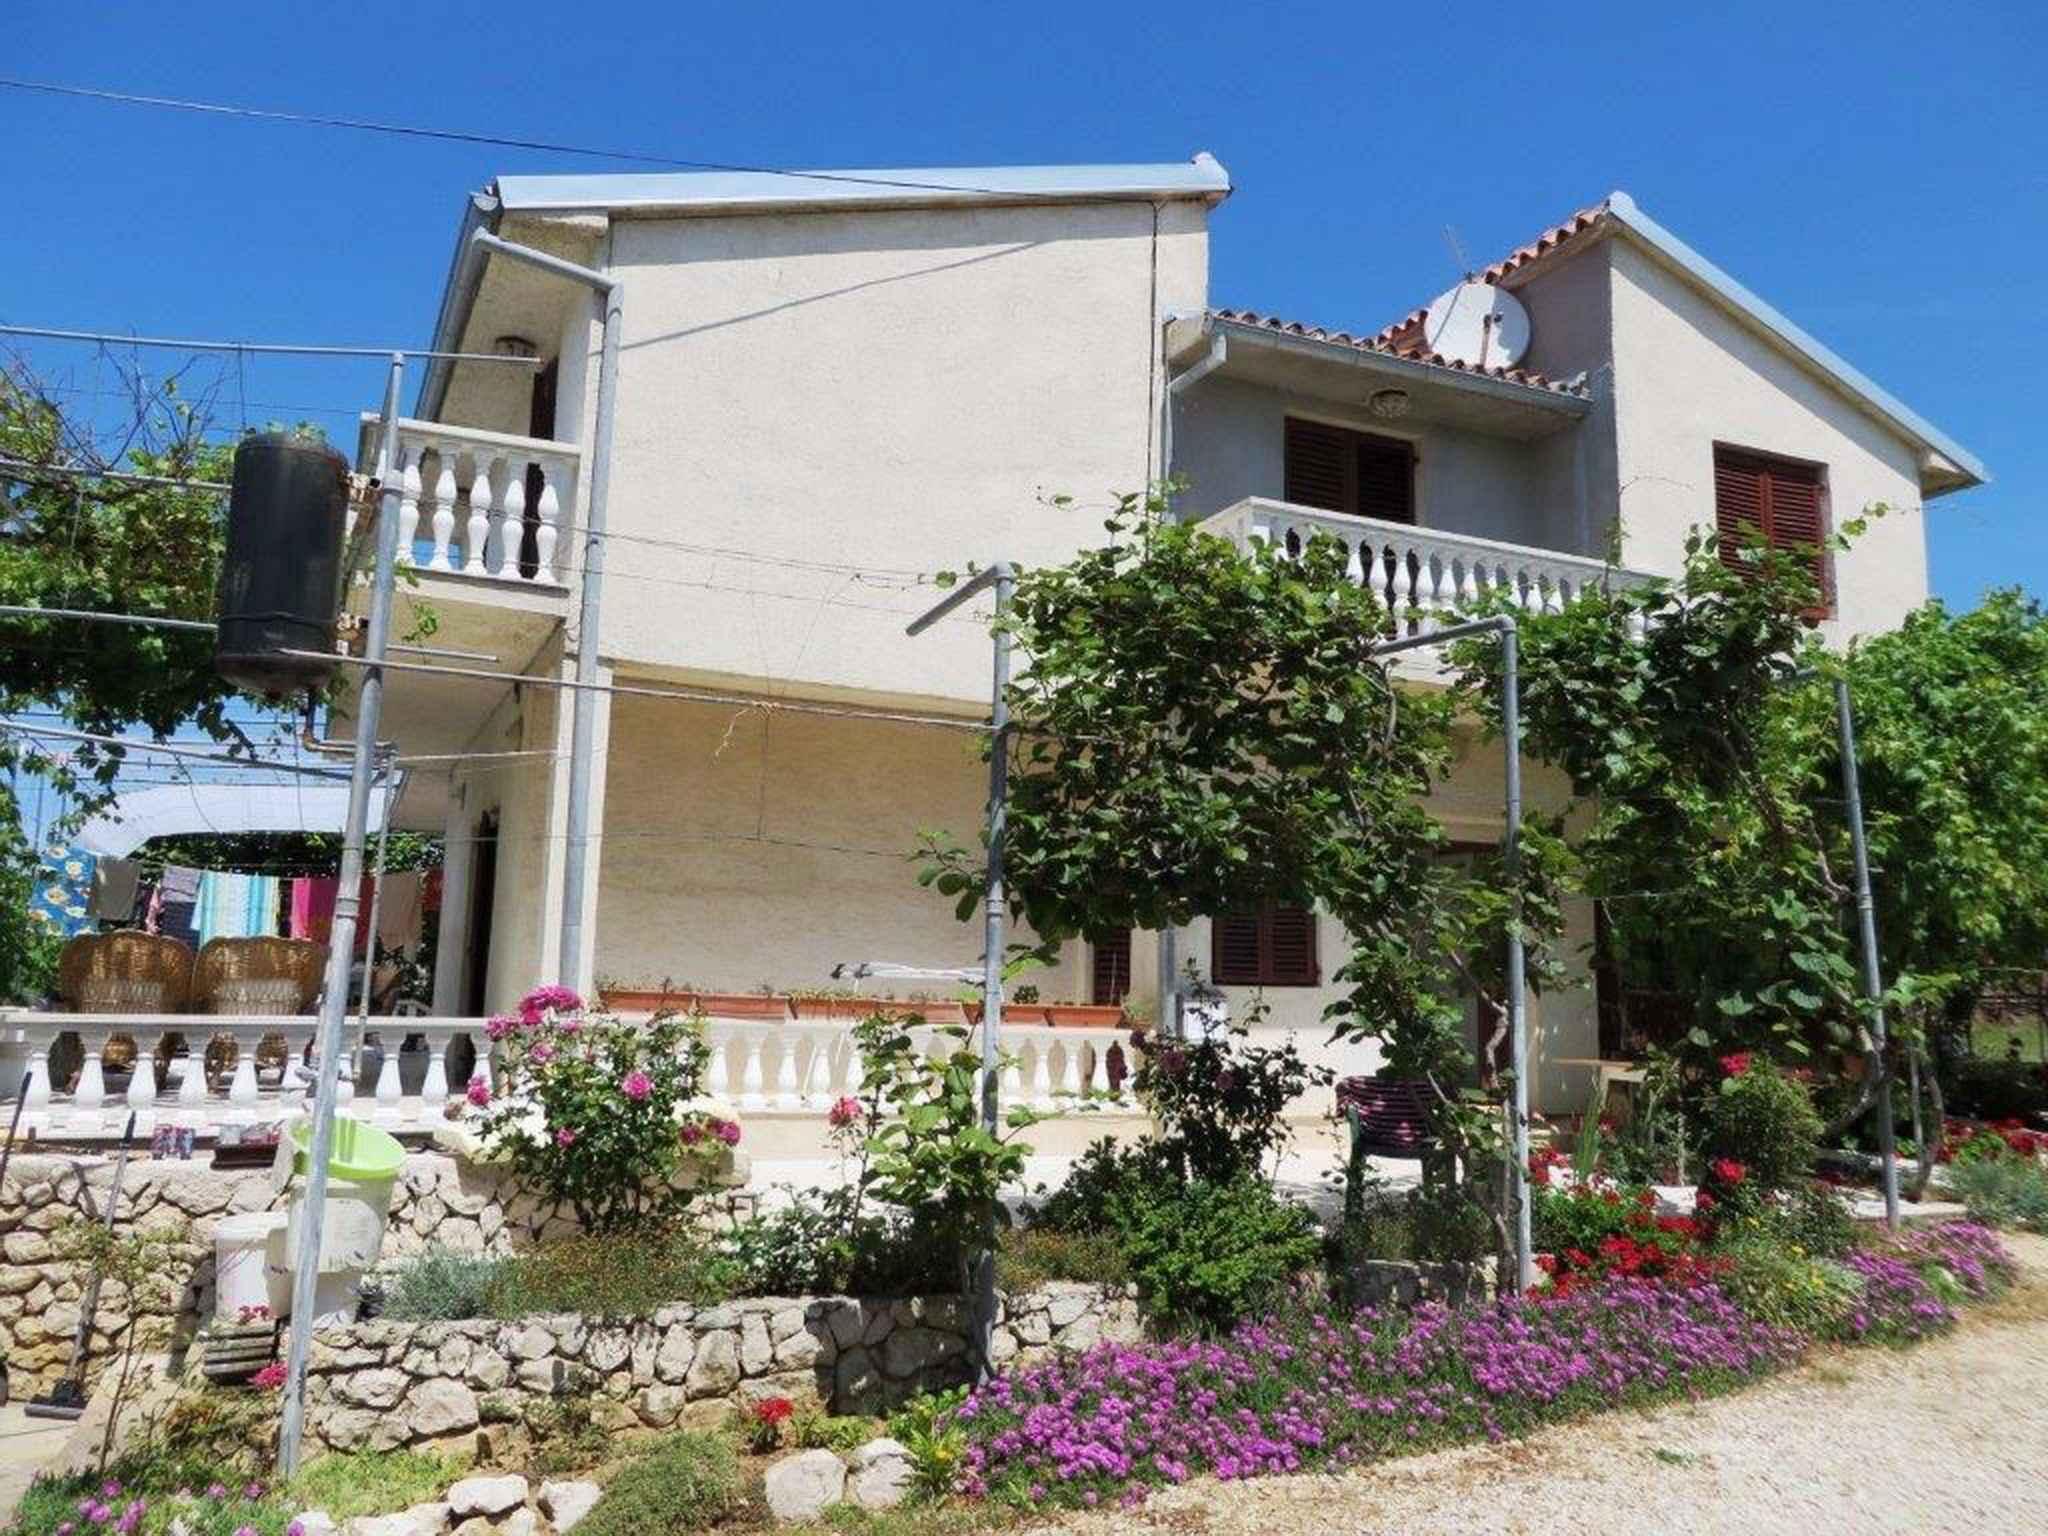 Ferienhaus samo 80 metara od Jadranskog mora (325274), Vrsi, , Dalmatien, Kroatien, Bild 2